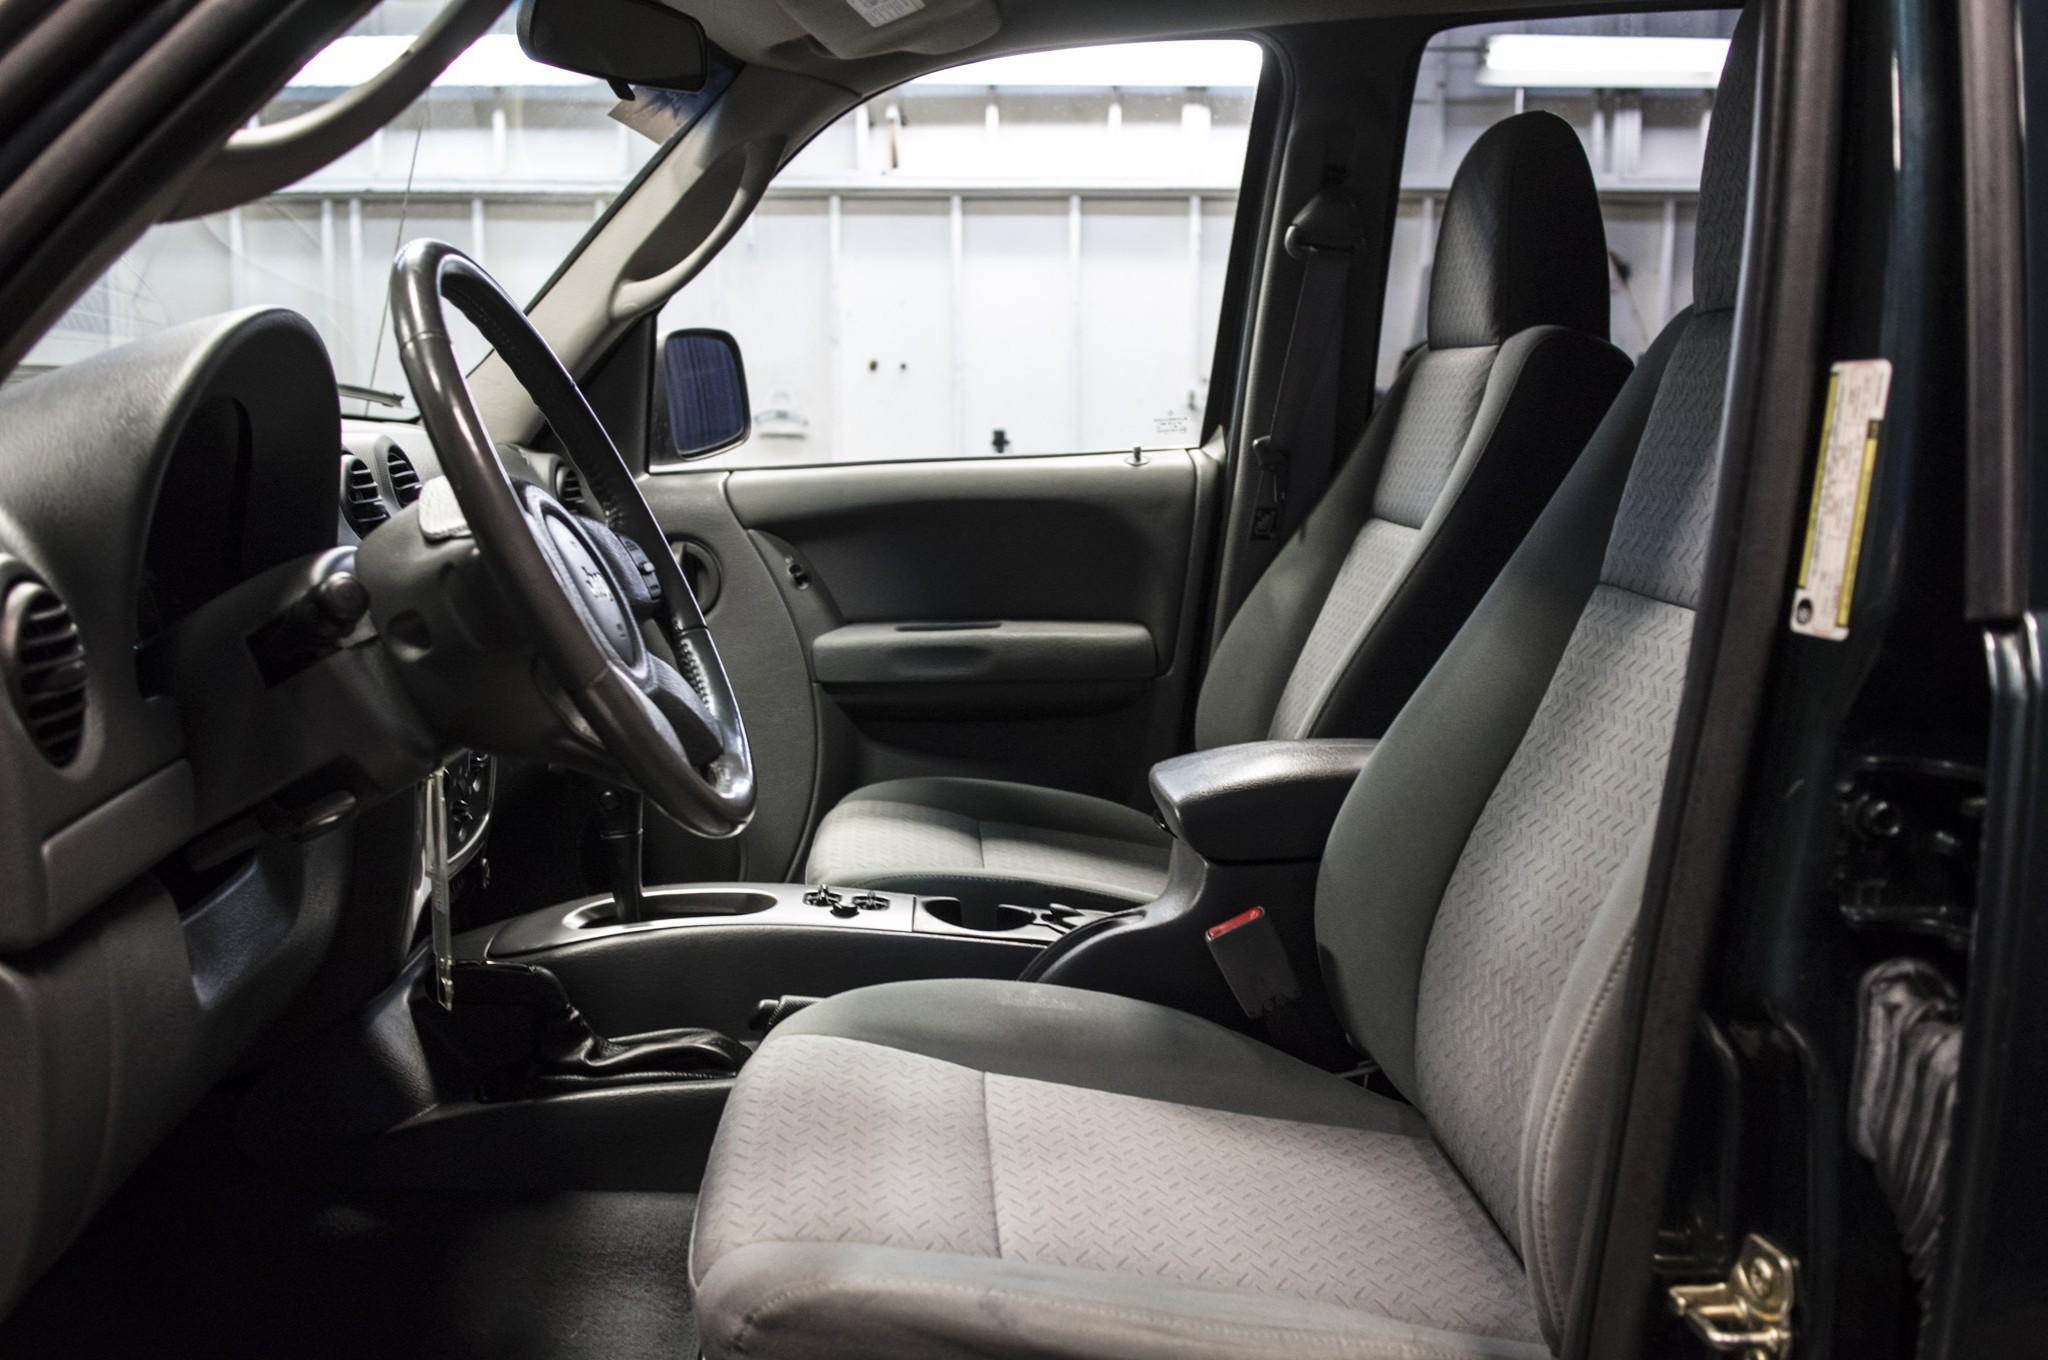 2005 jeep liberty renegade 4x4 - northwest motorsport